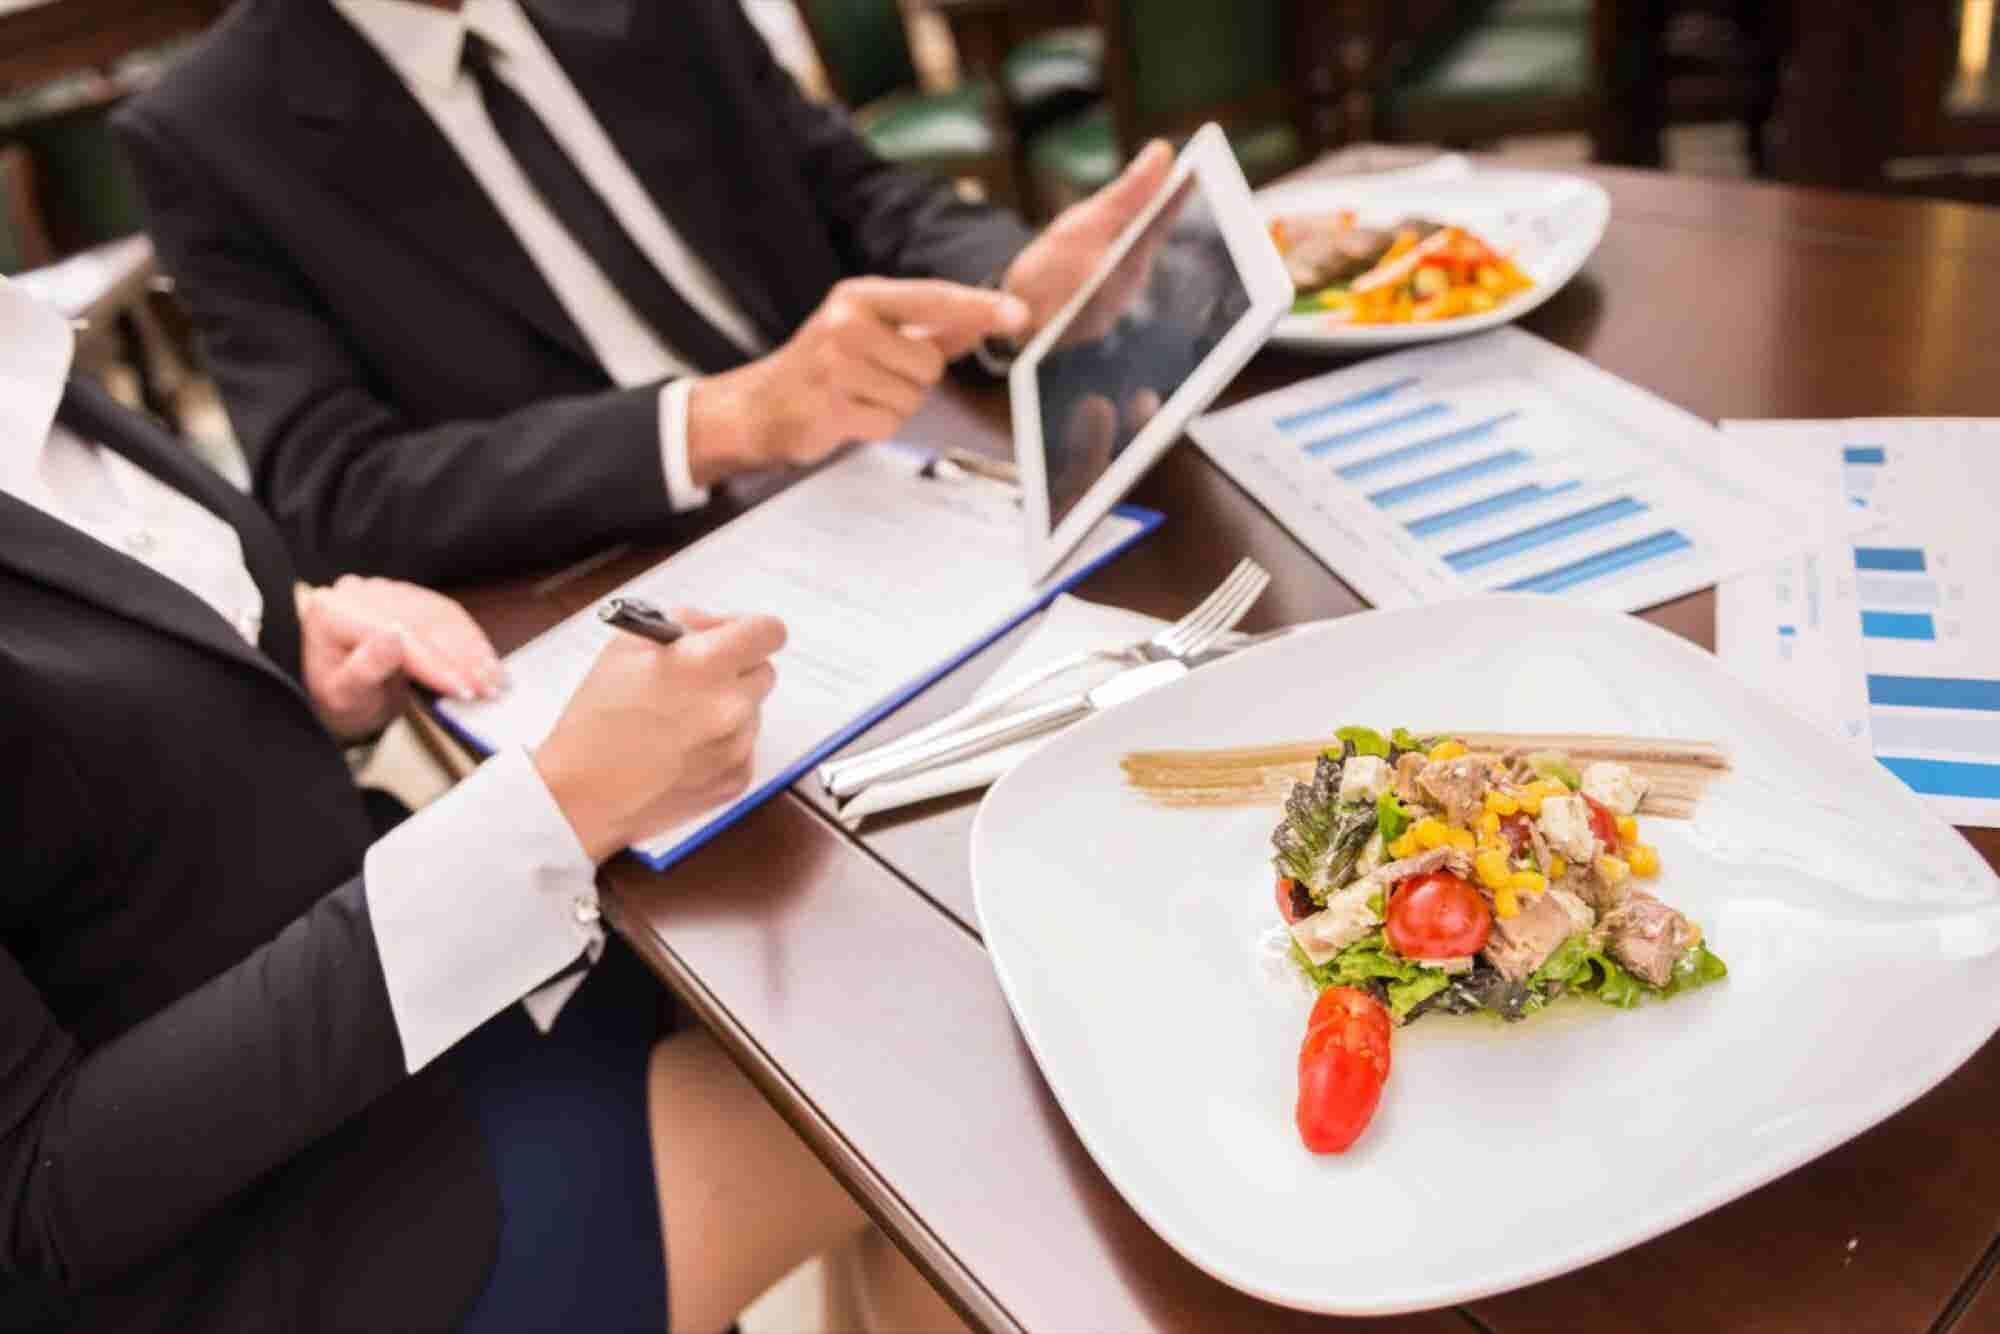 Growth Hacking F&B Franchising: Smart Mavericks Versus Traditional Partners